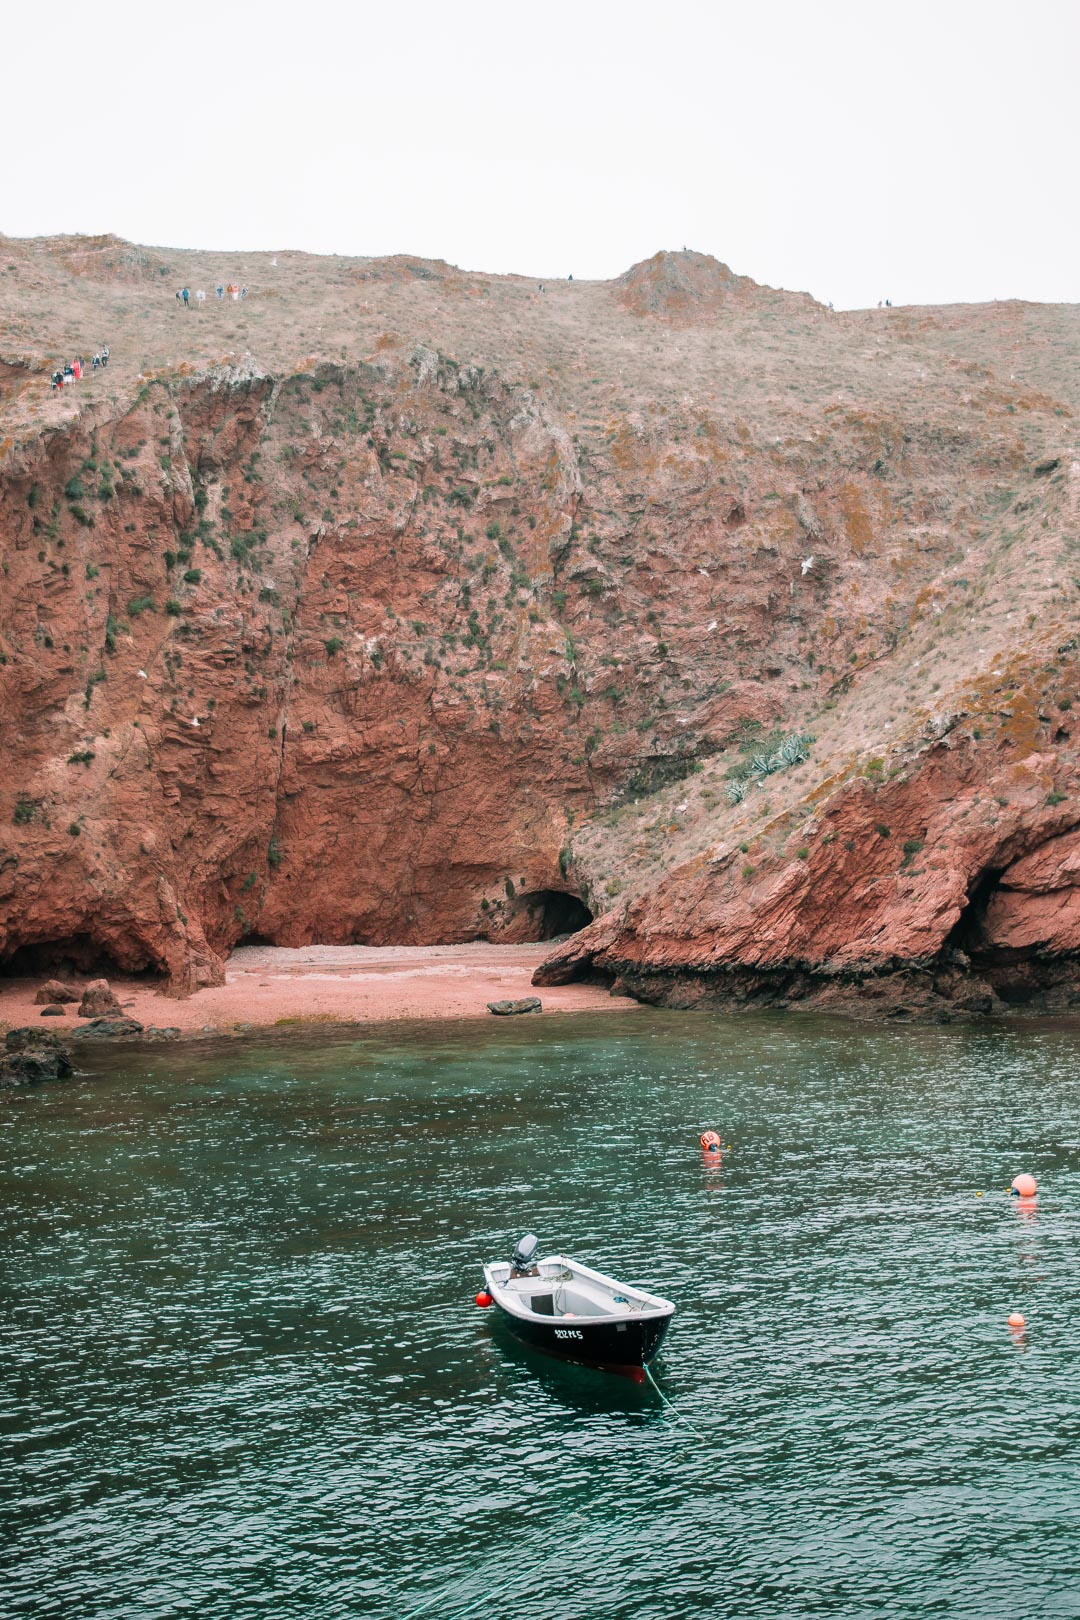 The coastline of the Berlenga Islands